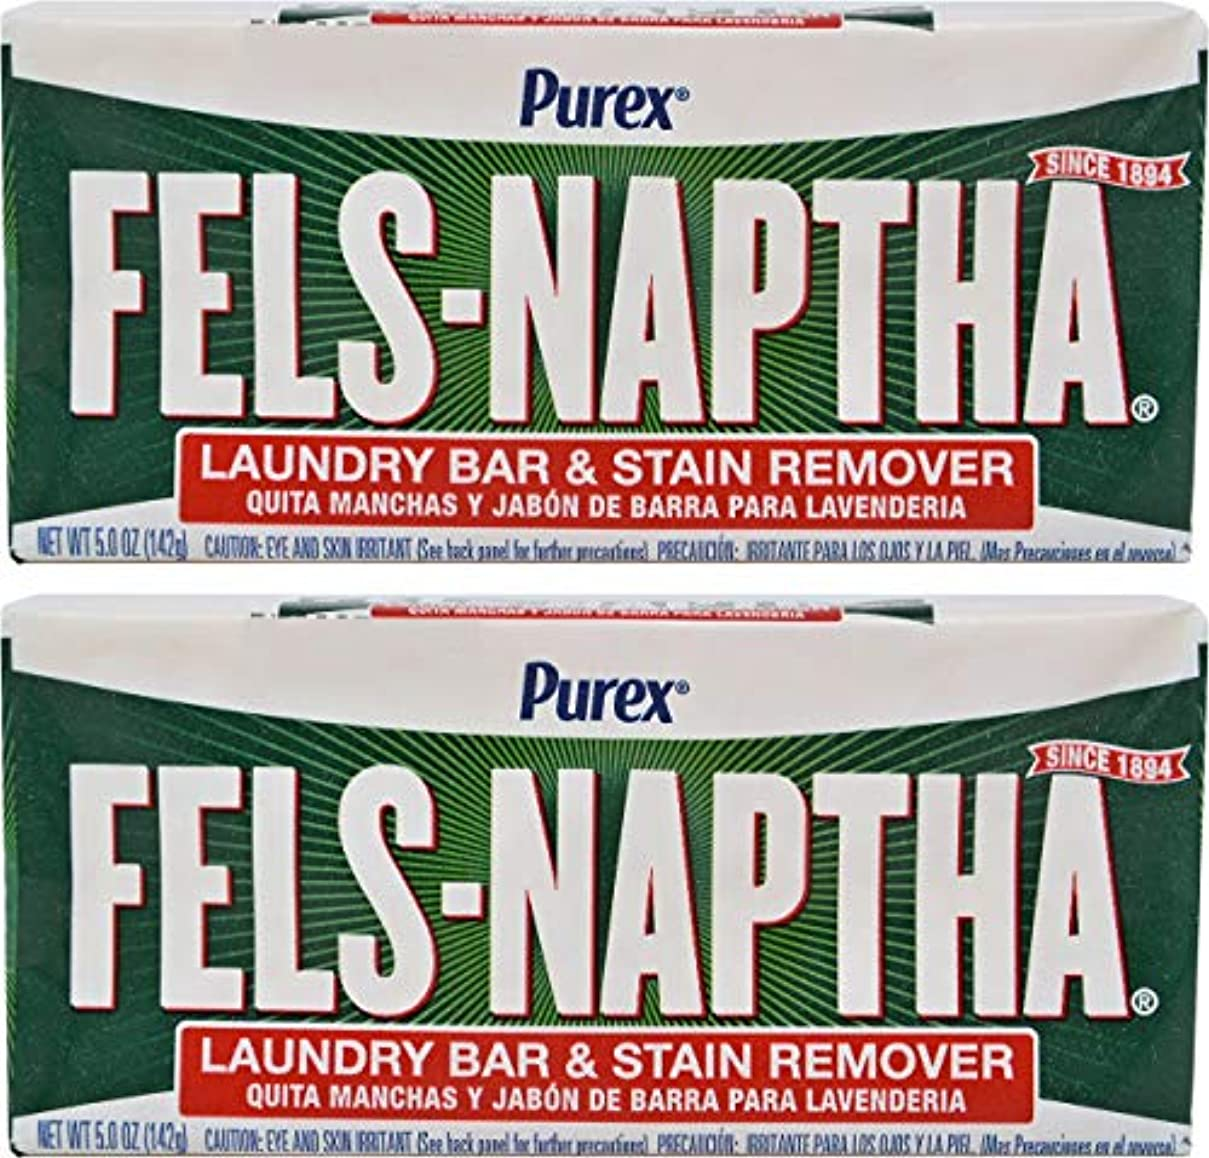 Fels Naptha Heavy Duty Laundry Soap Bar - 5.5 oz - 2 pk by Fels Naptha